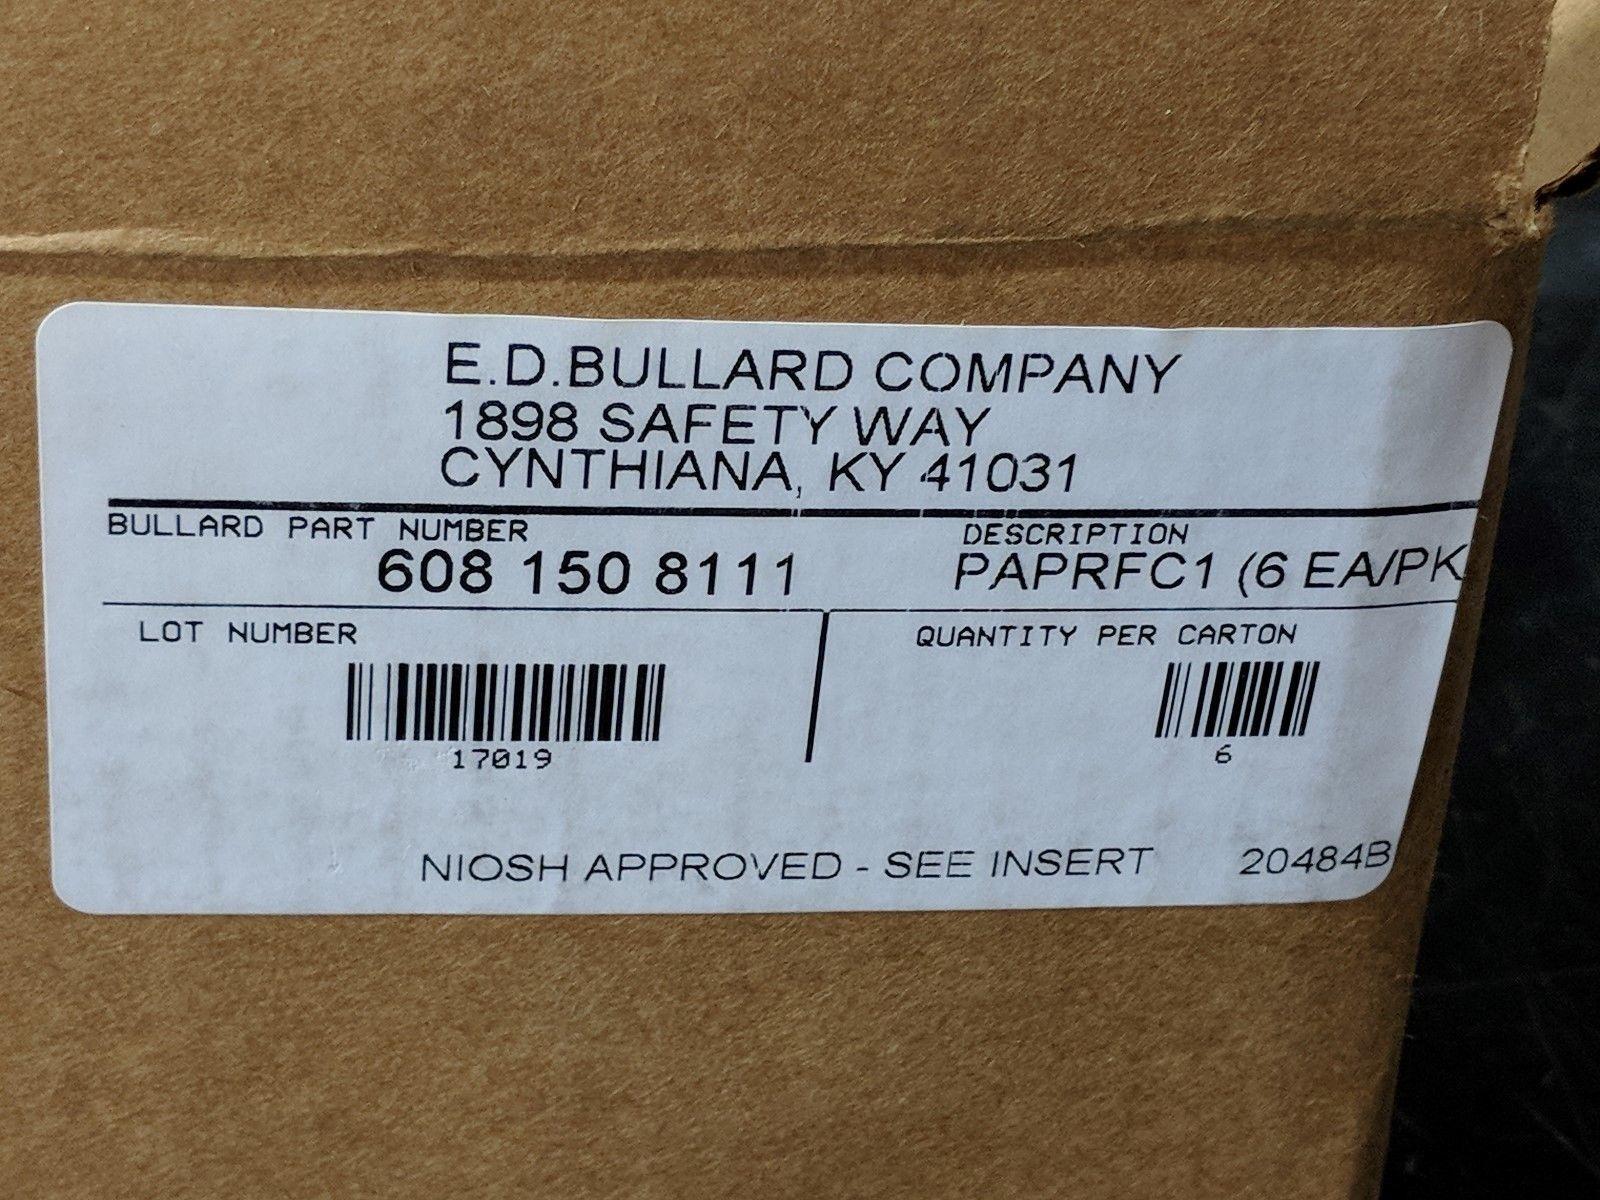 BULLARD PAPRFC1 / LOT OF 8 BOXES / 6 FILTERS PER BOX